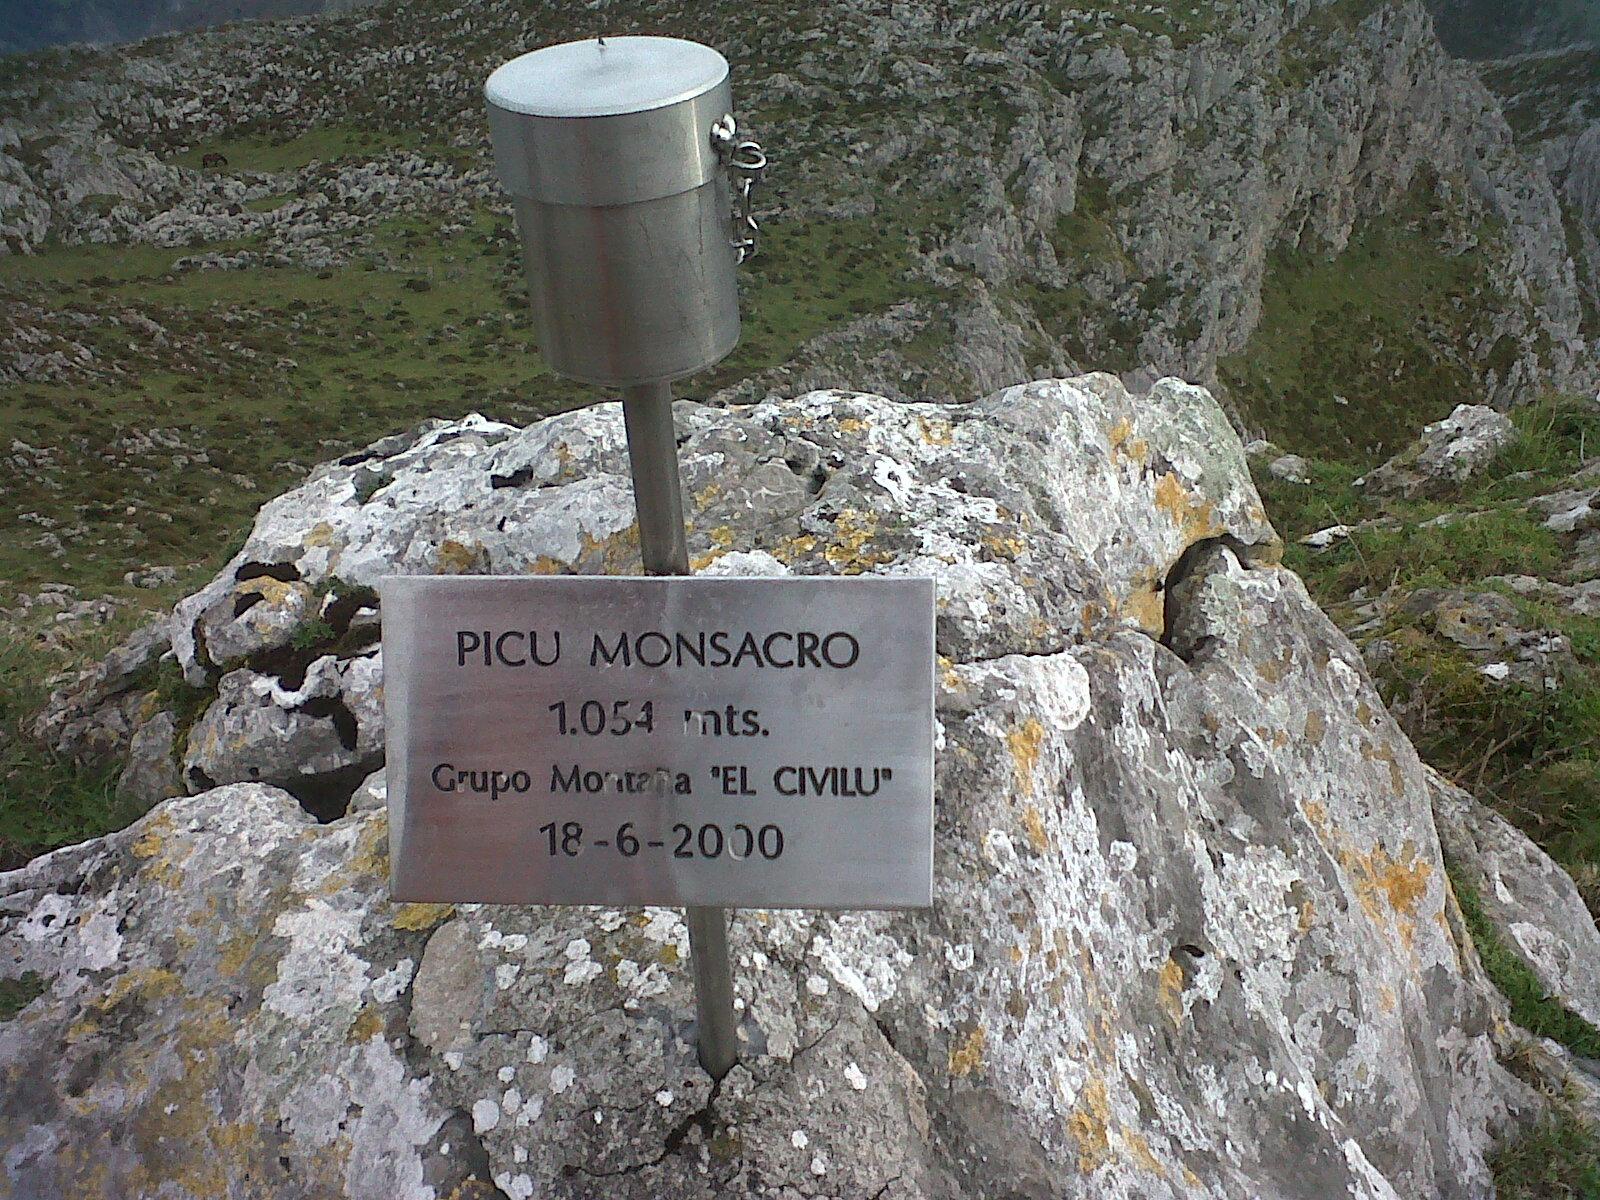 Pico Monsacro